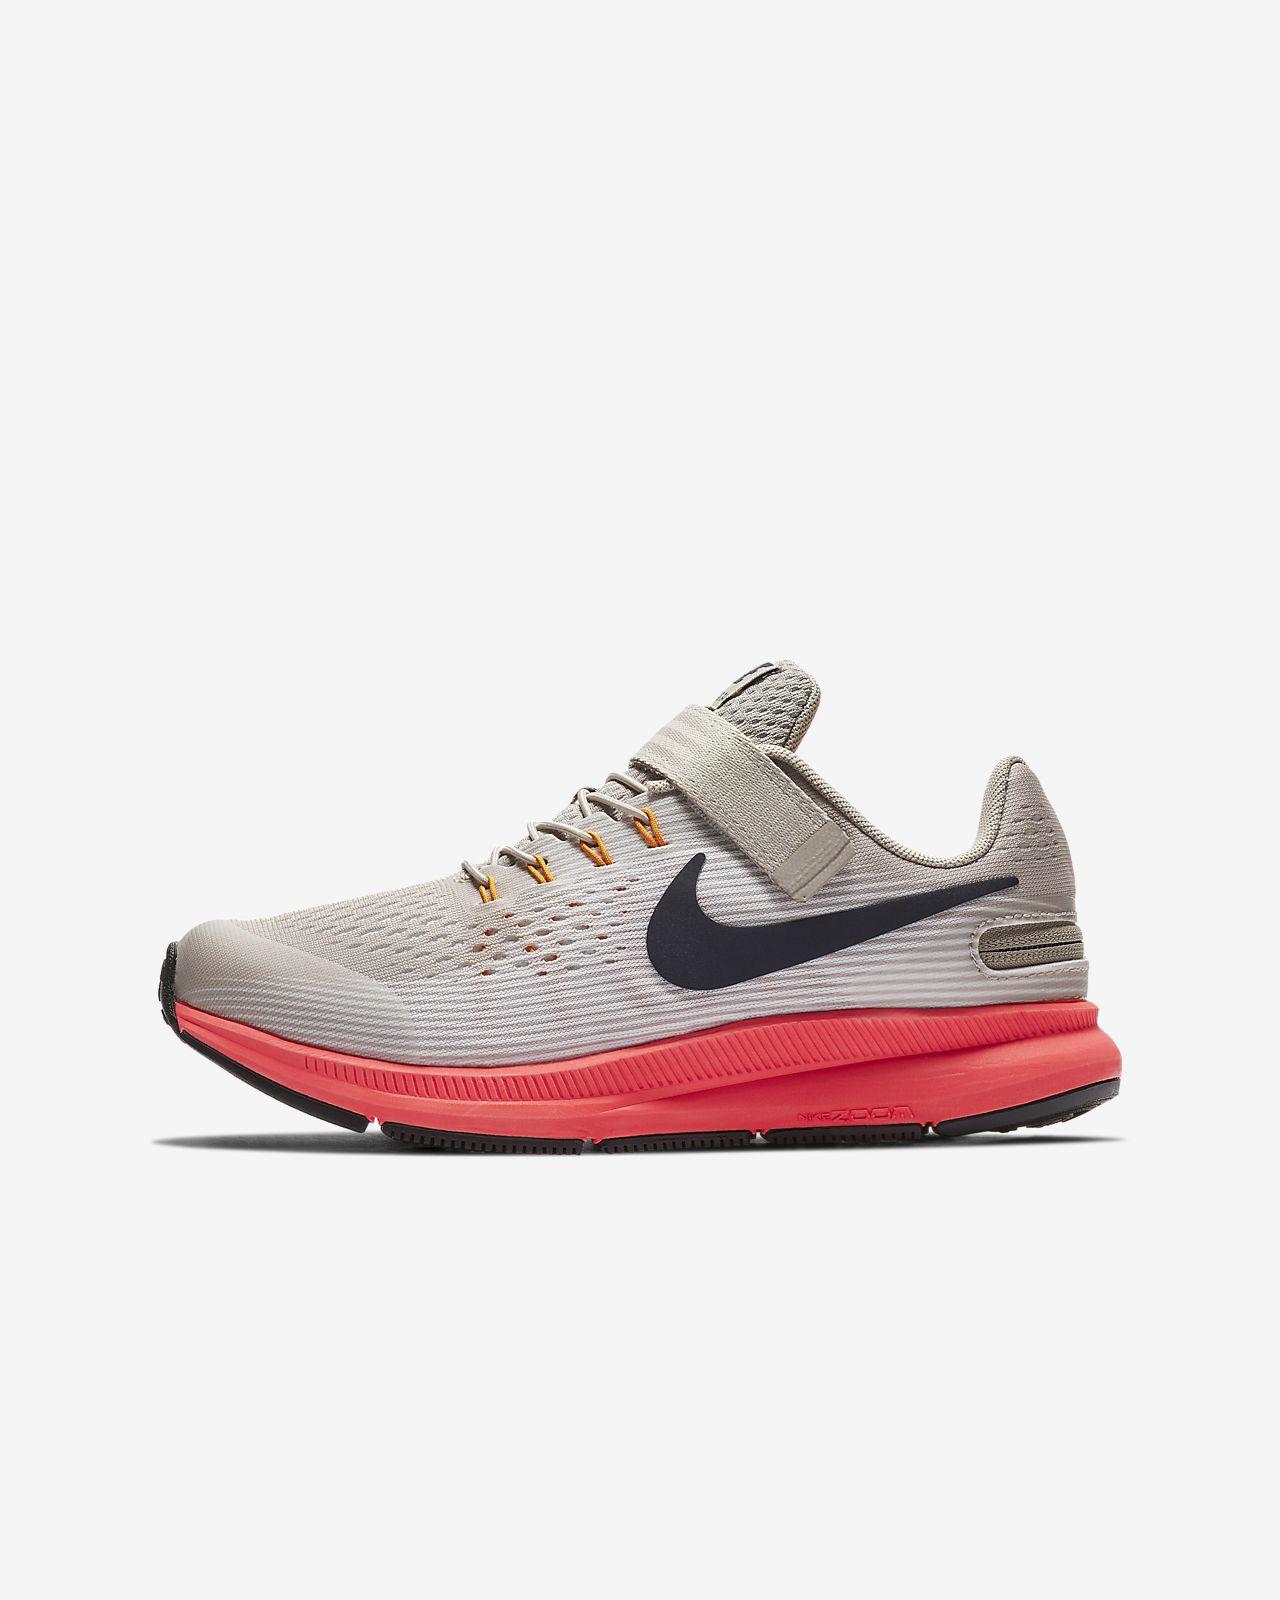 d24fac639 Nike Zoom Pegasus 34 FlyEase Little Big Kids  Running Shoe. Nike.com